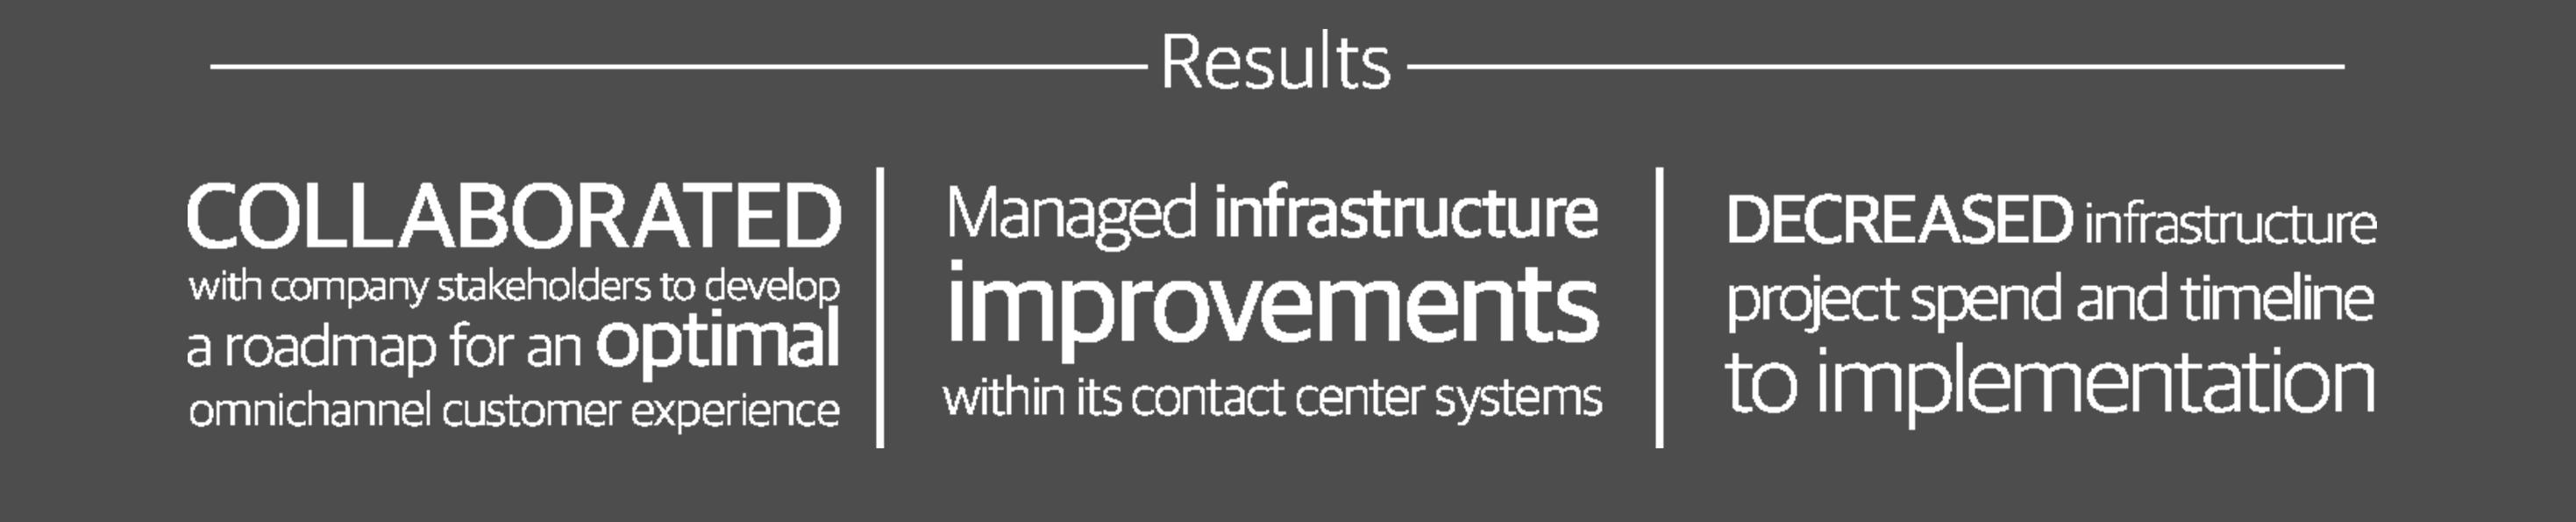 We helped develop a strategic roadmap for sharing customer data across channels